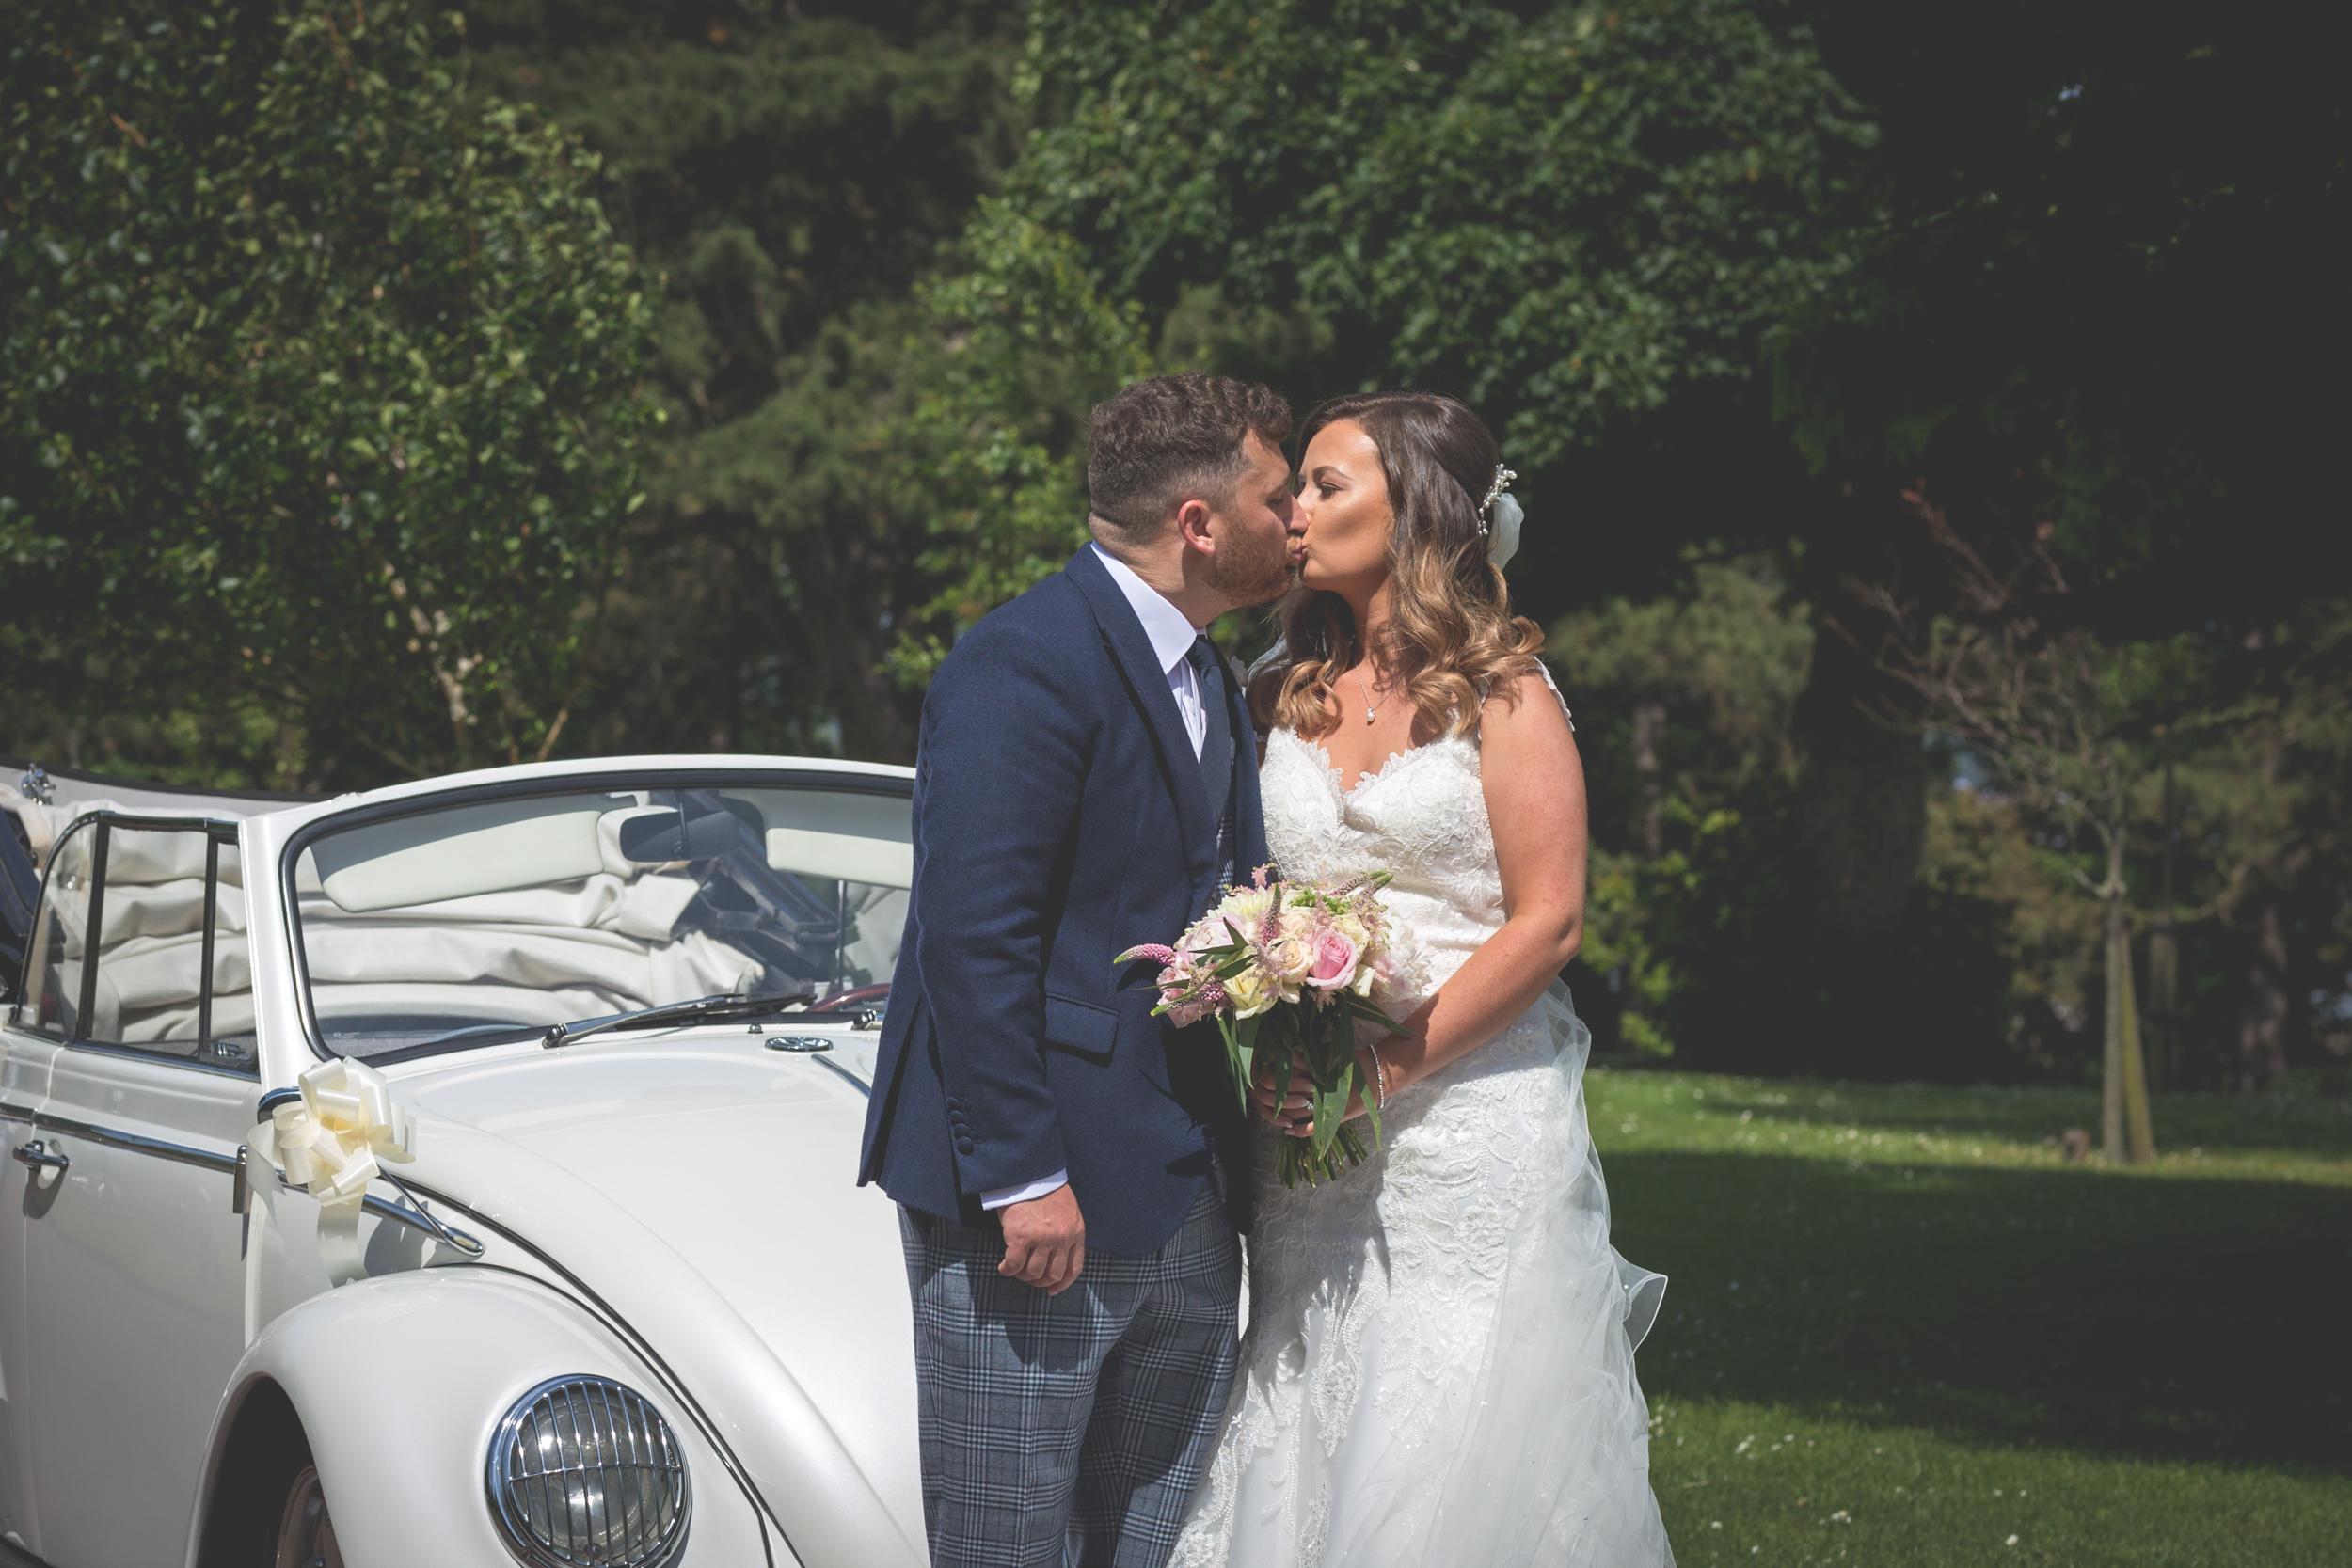 Brian McEwan   Northern Ireland Wedding Photographer   Rebecca & Michael   Portraits-15.jpg